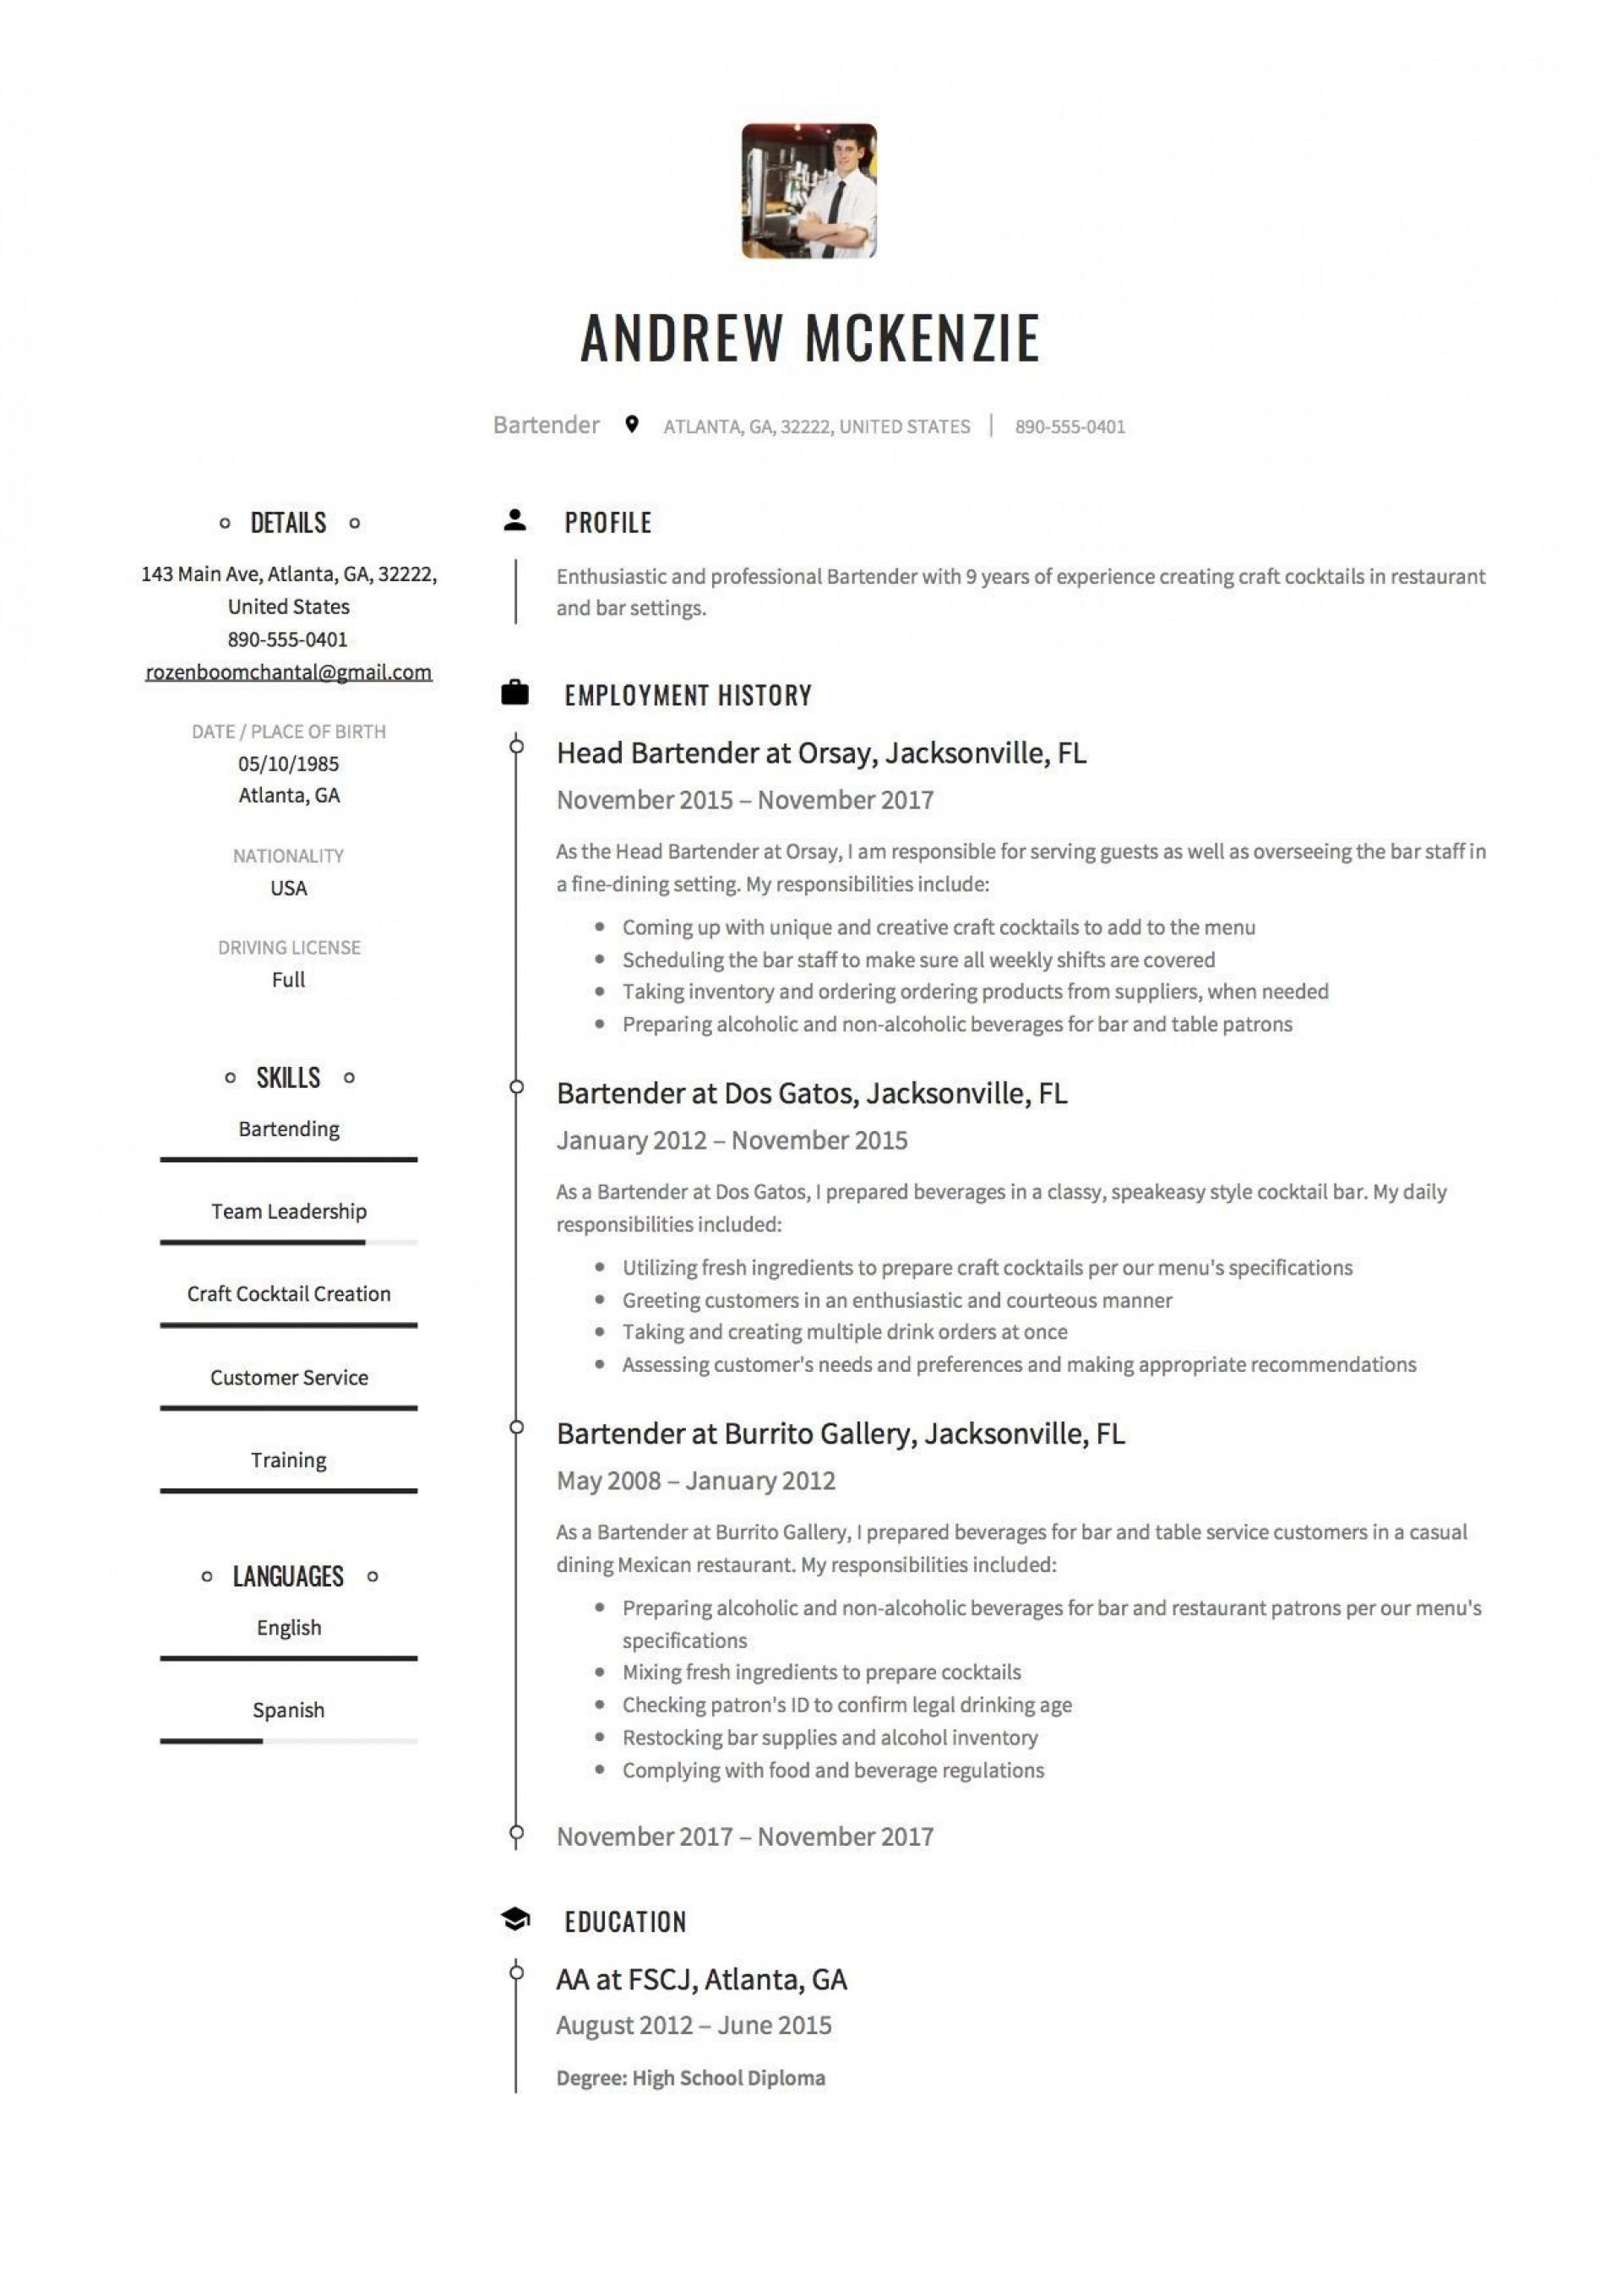 004 Wondrou Free Resume Template 2018 Printable High Resolution 1920